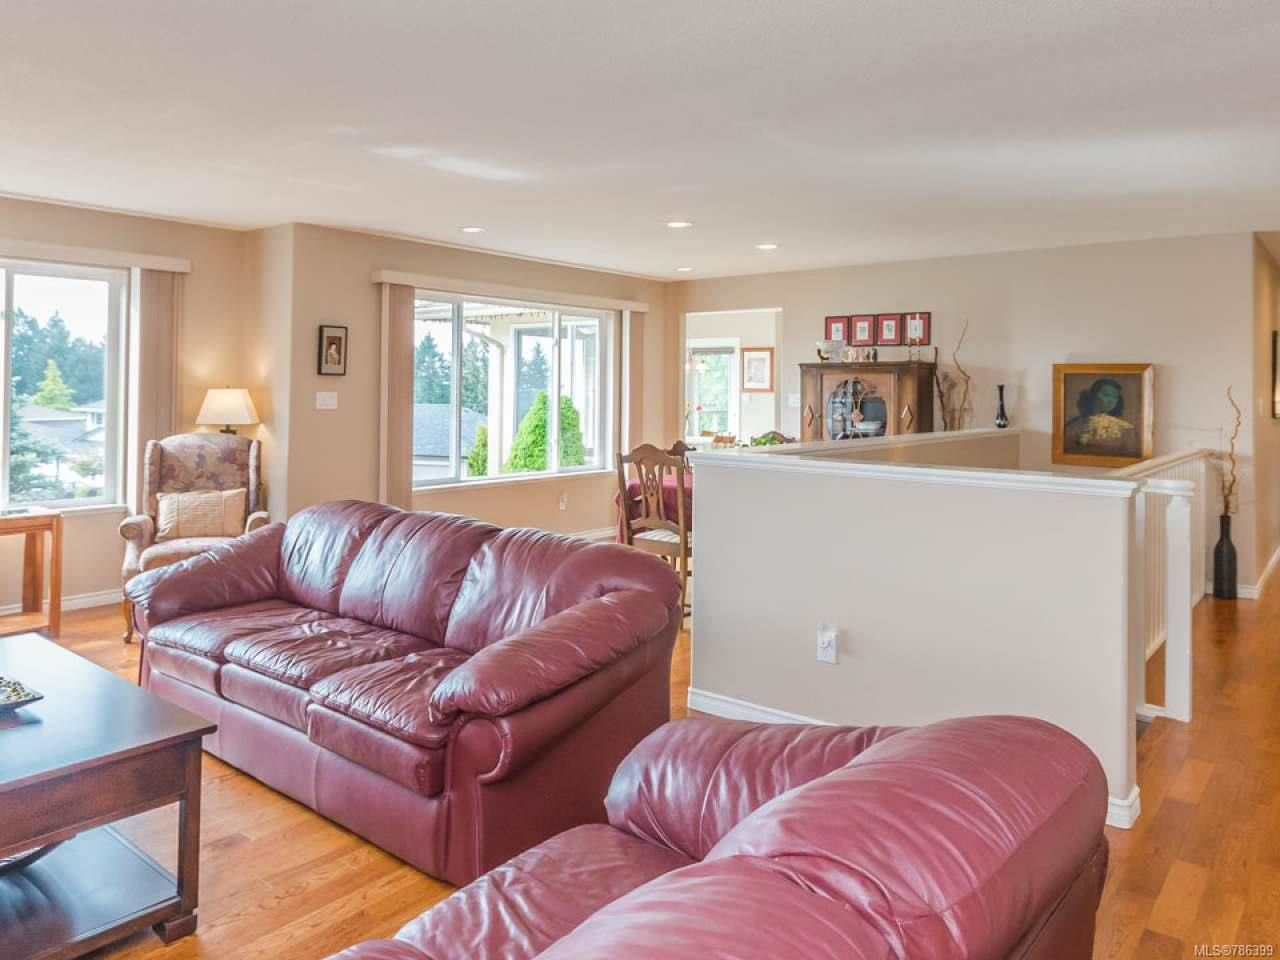 Photo 16: Photos: 5371 HIGHRIDGE PLACE in NANAIMO: Na North Nanaimo House for sale (Nanaimo)  : MLS®# 786399